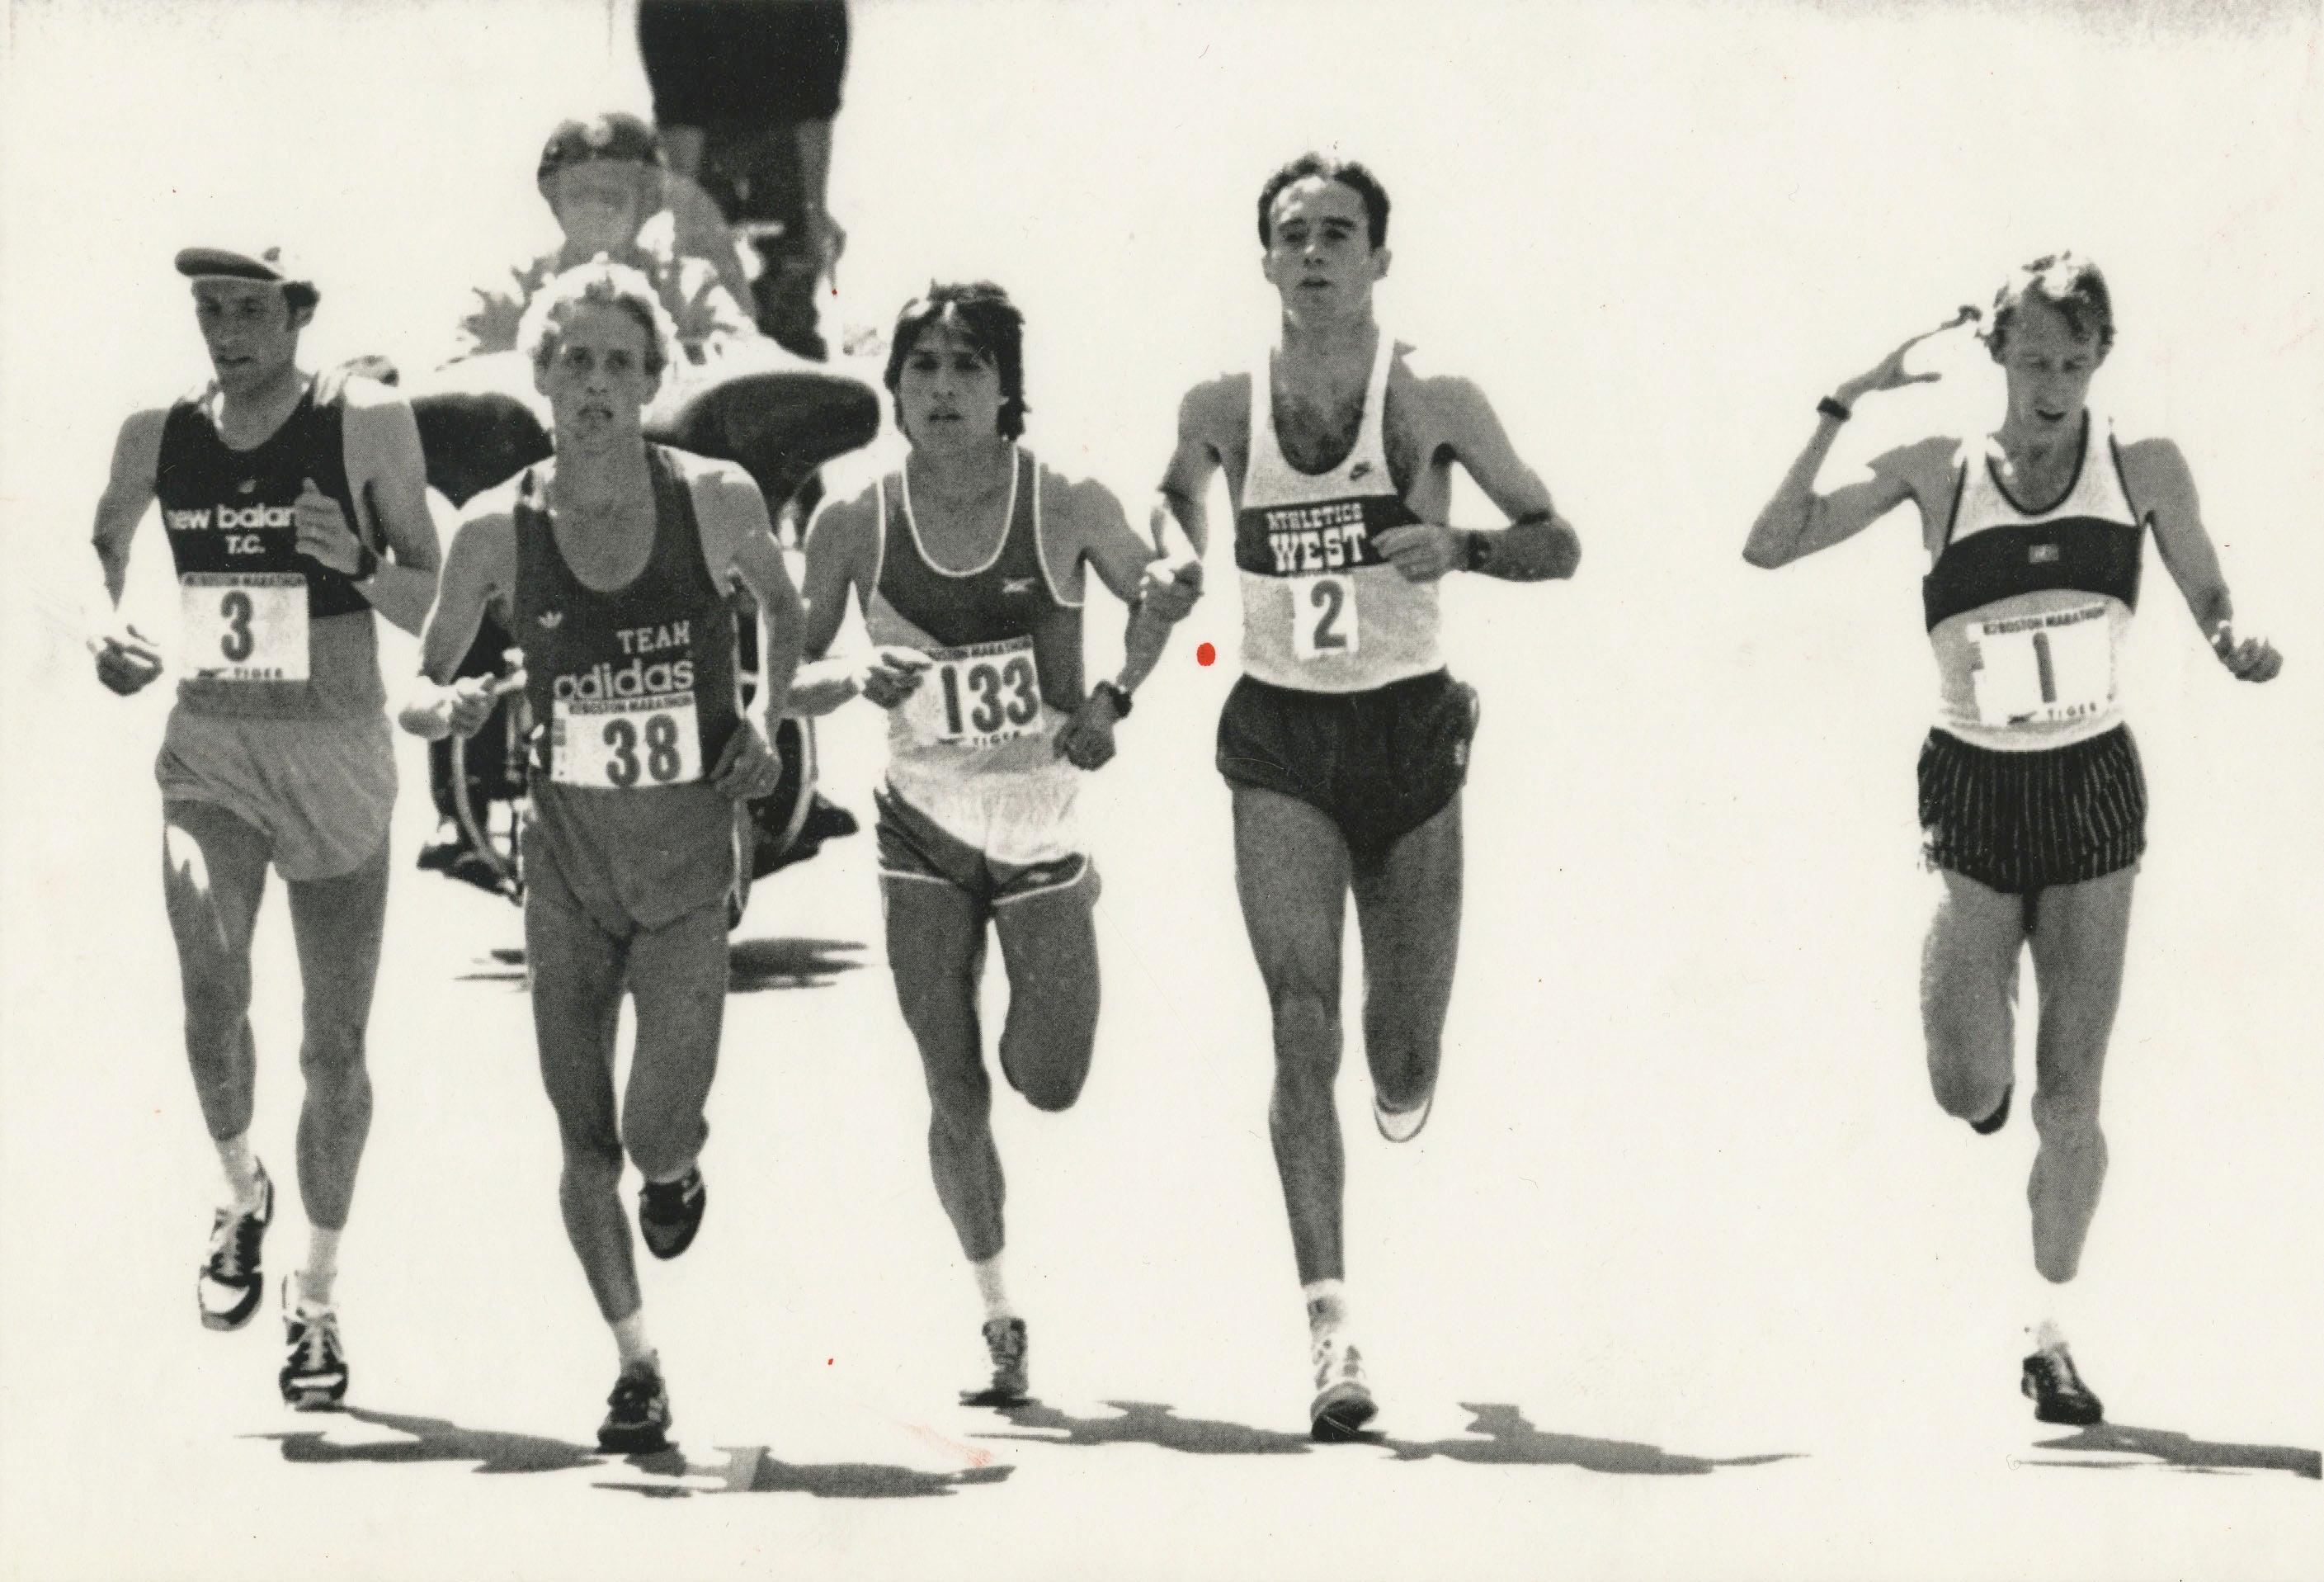 1982 Boston Marathon 1